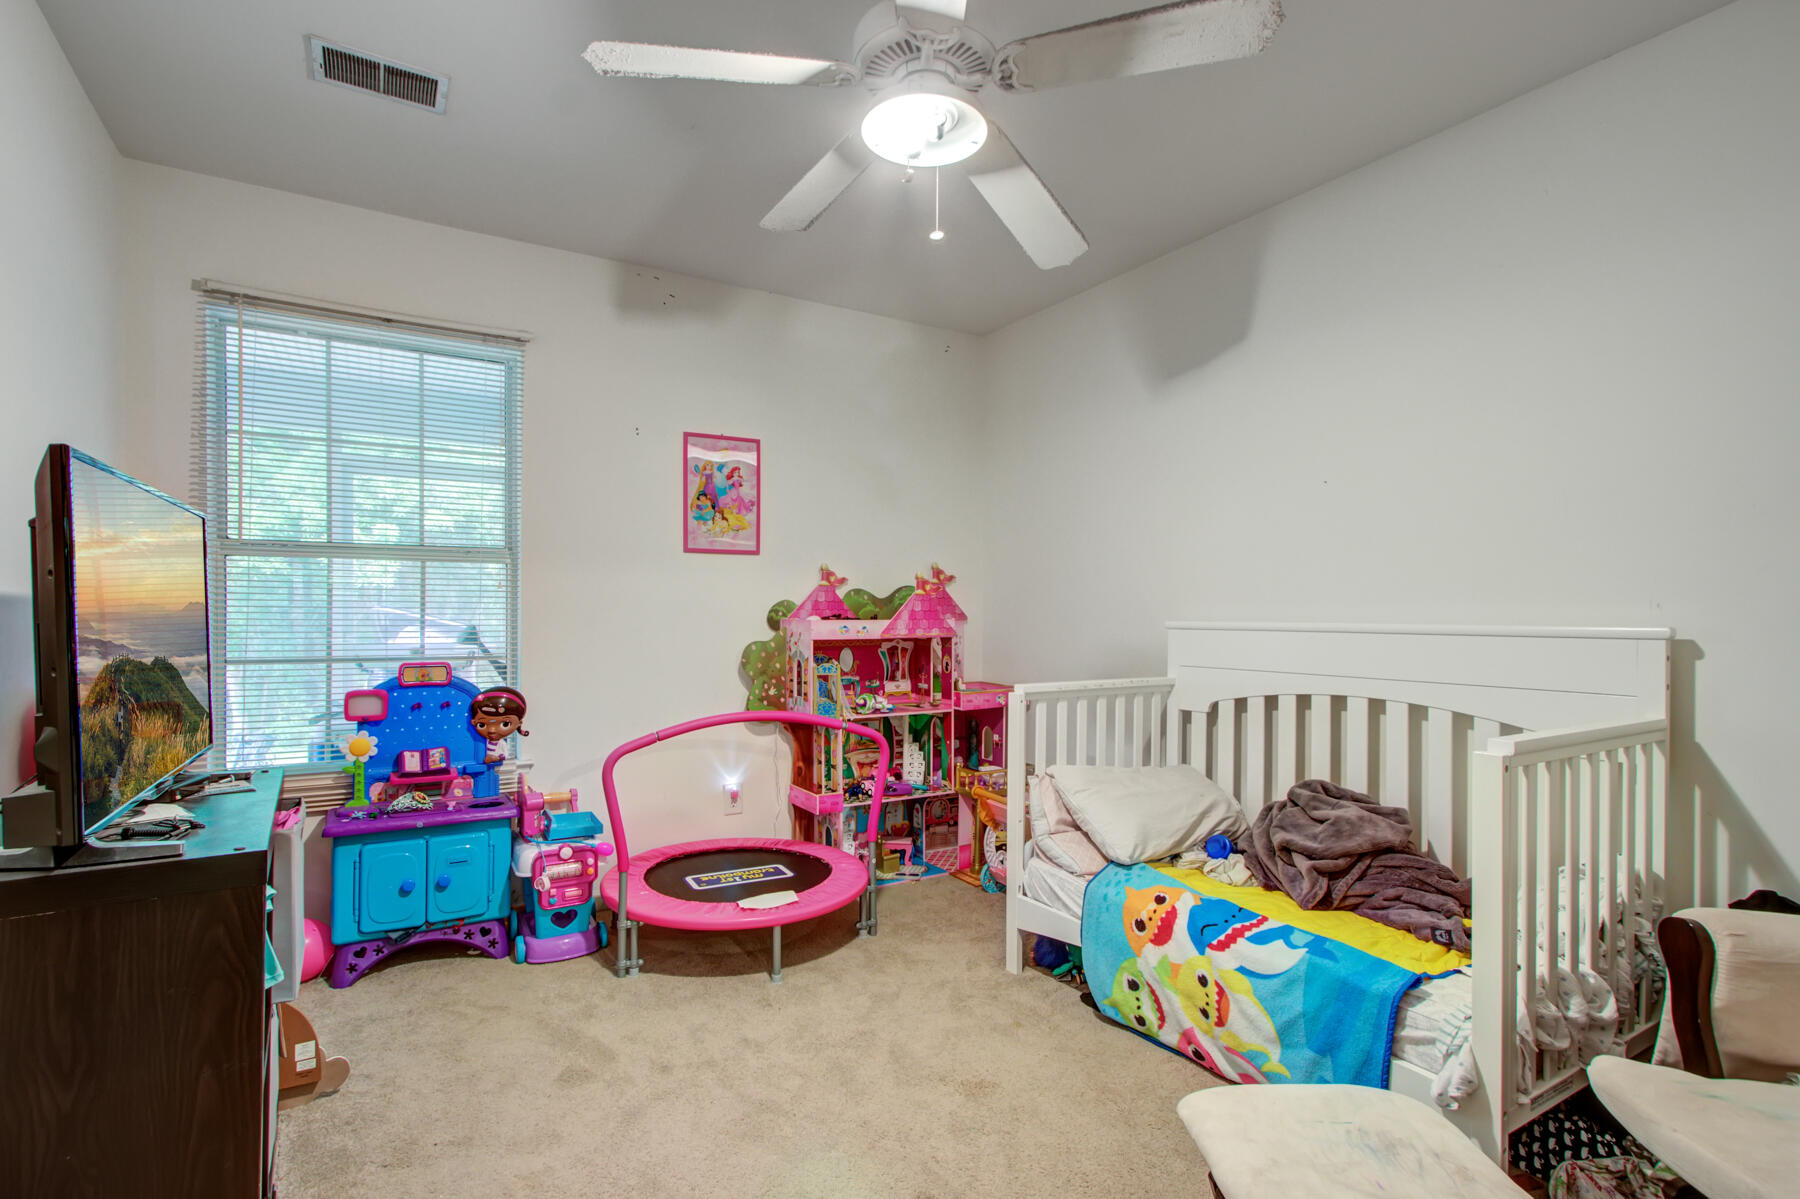 Dunes West Homes For Sale - 2232 Kings Gate, Mount Pleasant, SC - 18